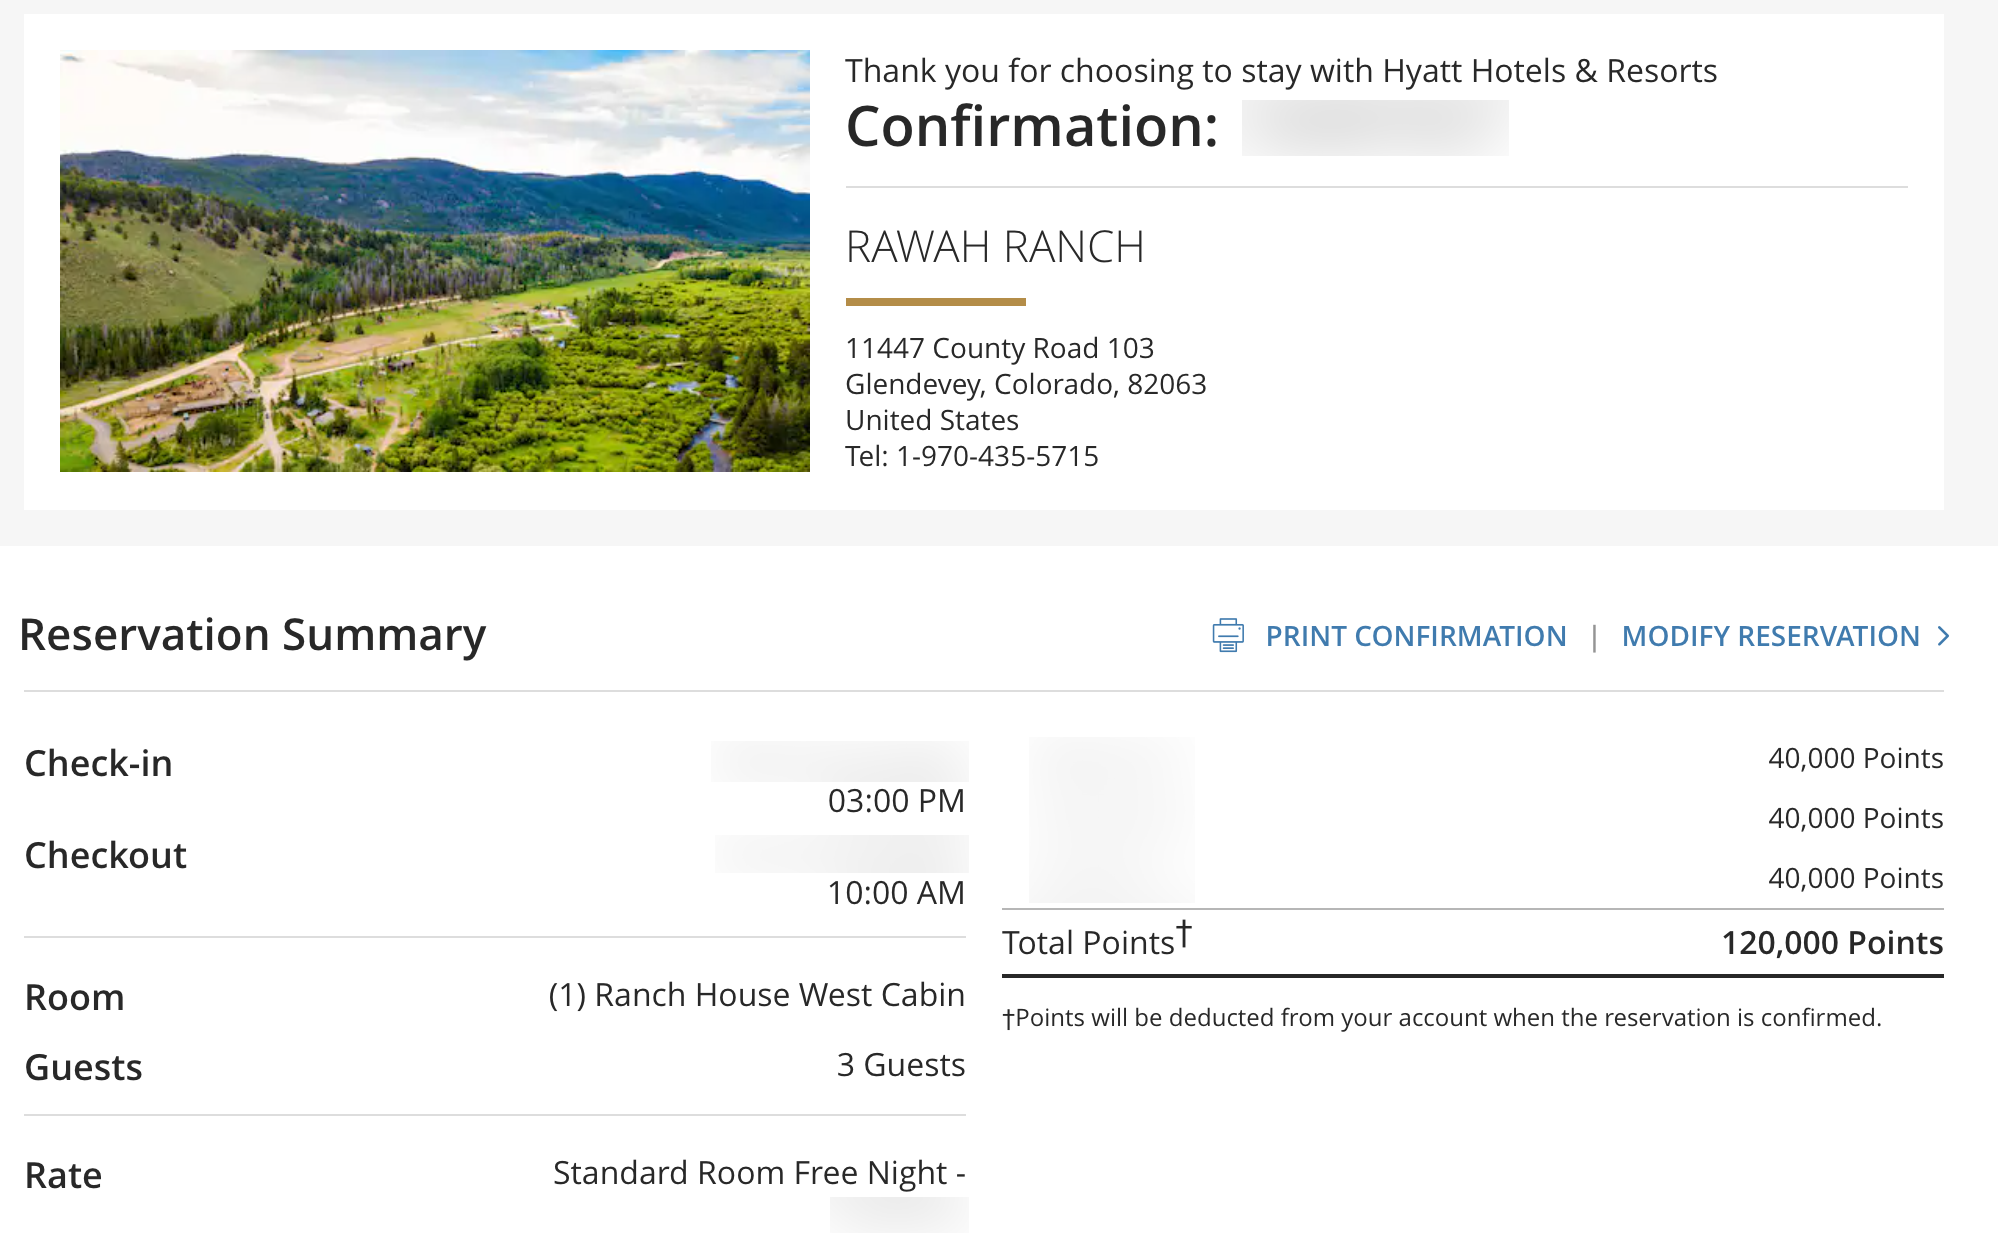 Reservation confirmation using Hyatt points at Rawah Ranch